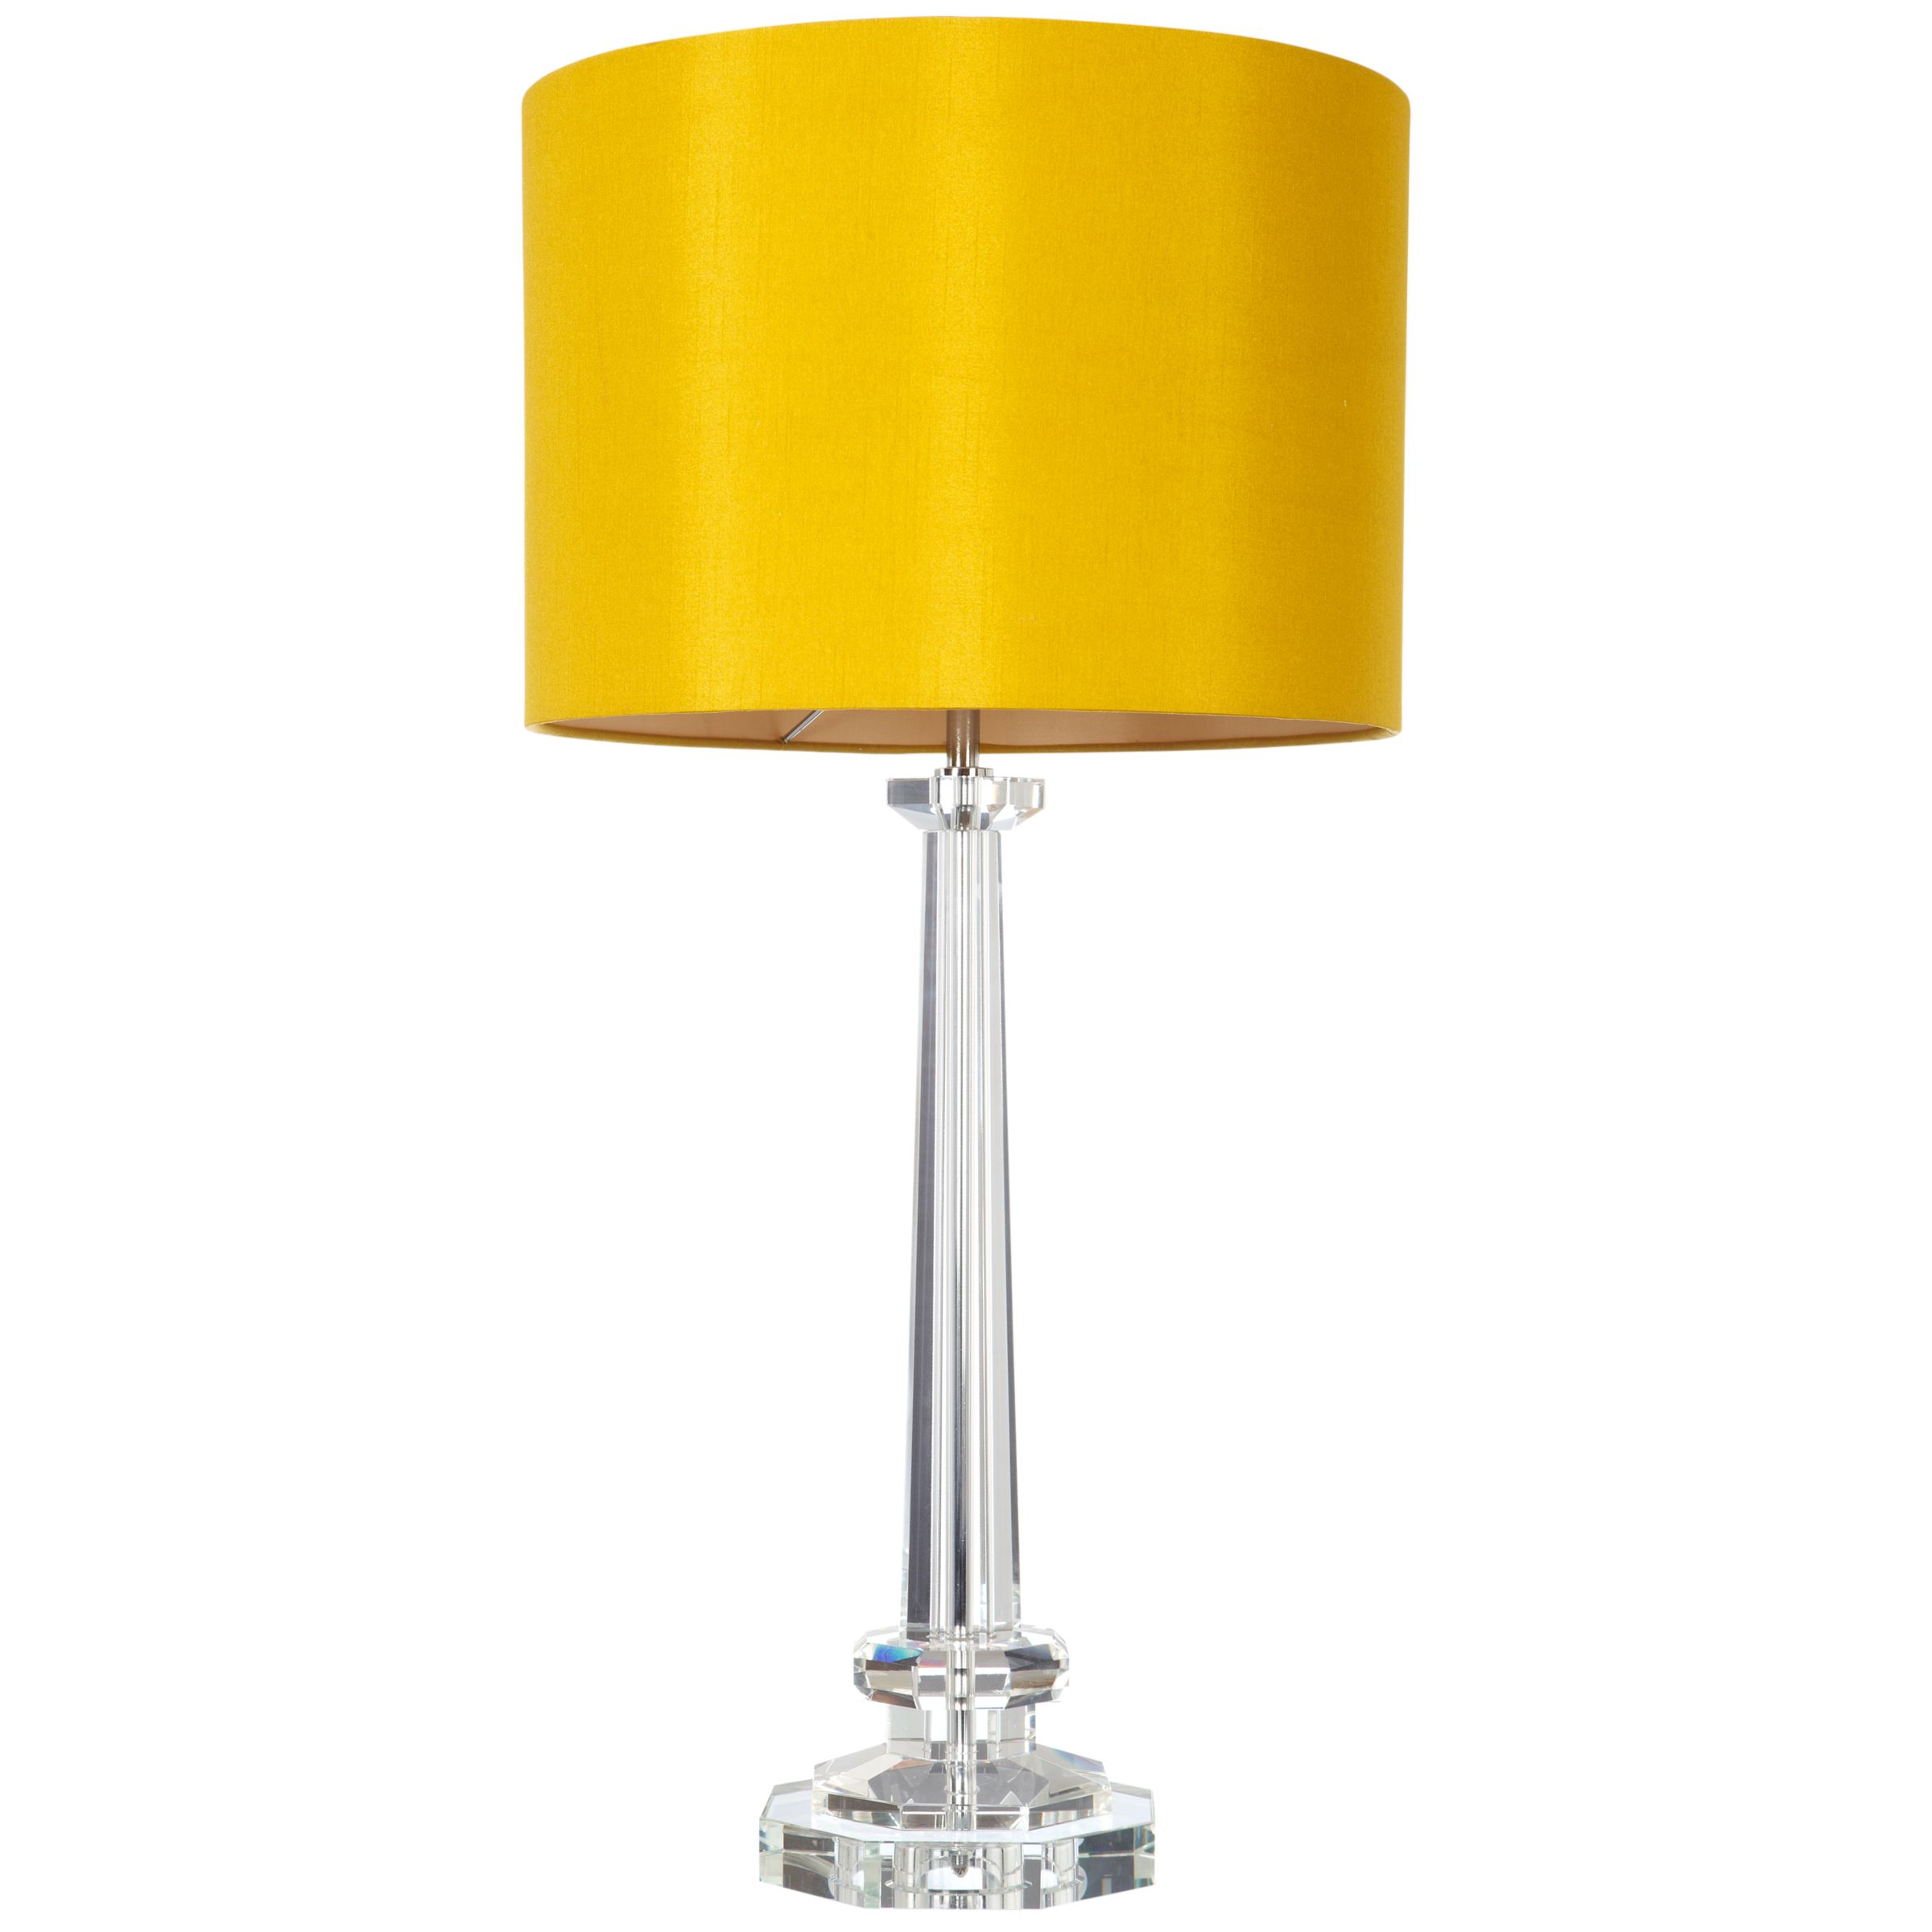 Popular Table Lamp Red 151695 John Lewis Batamba Lamp Table 230414865